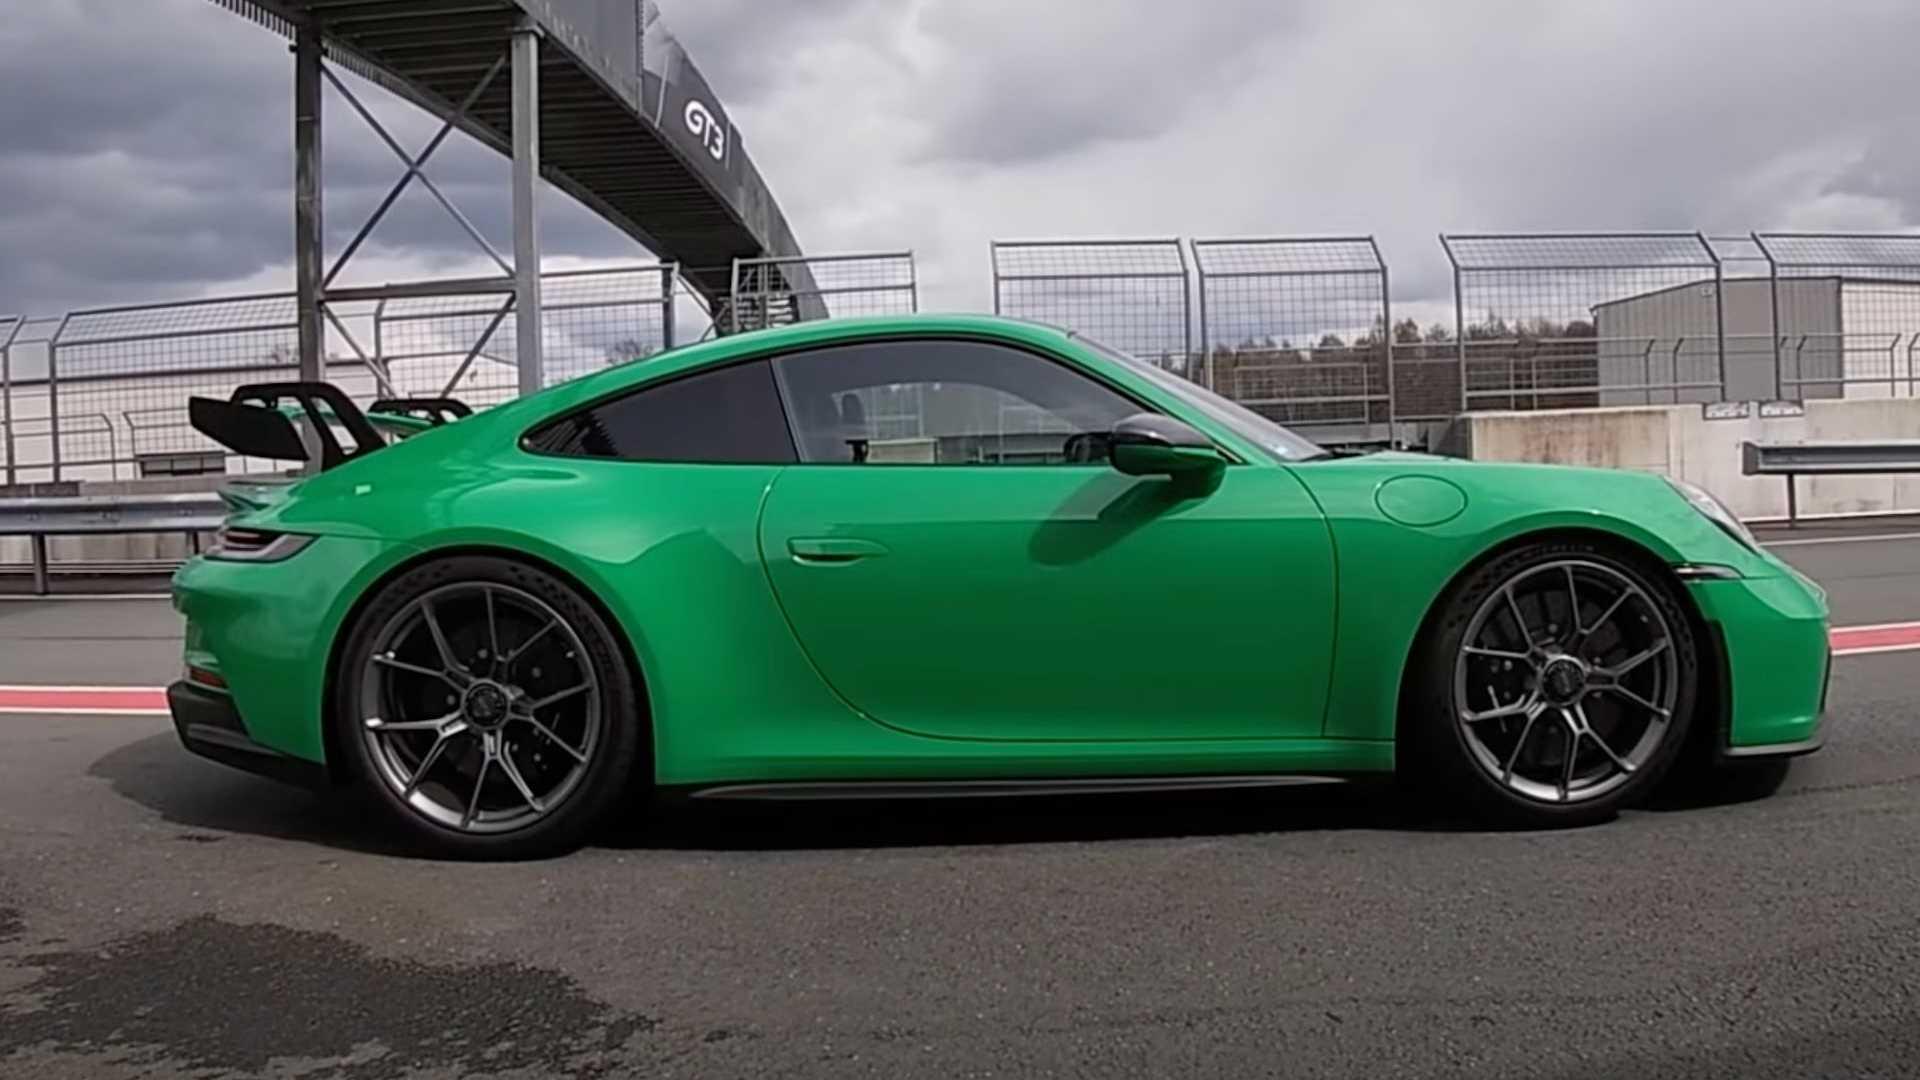 photo of 2022 Porsche 911 GT3 Acceleration Test Shows Quick Sprint To 124 MPH image